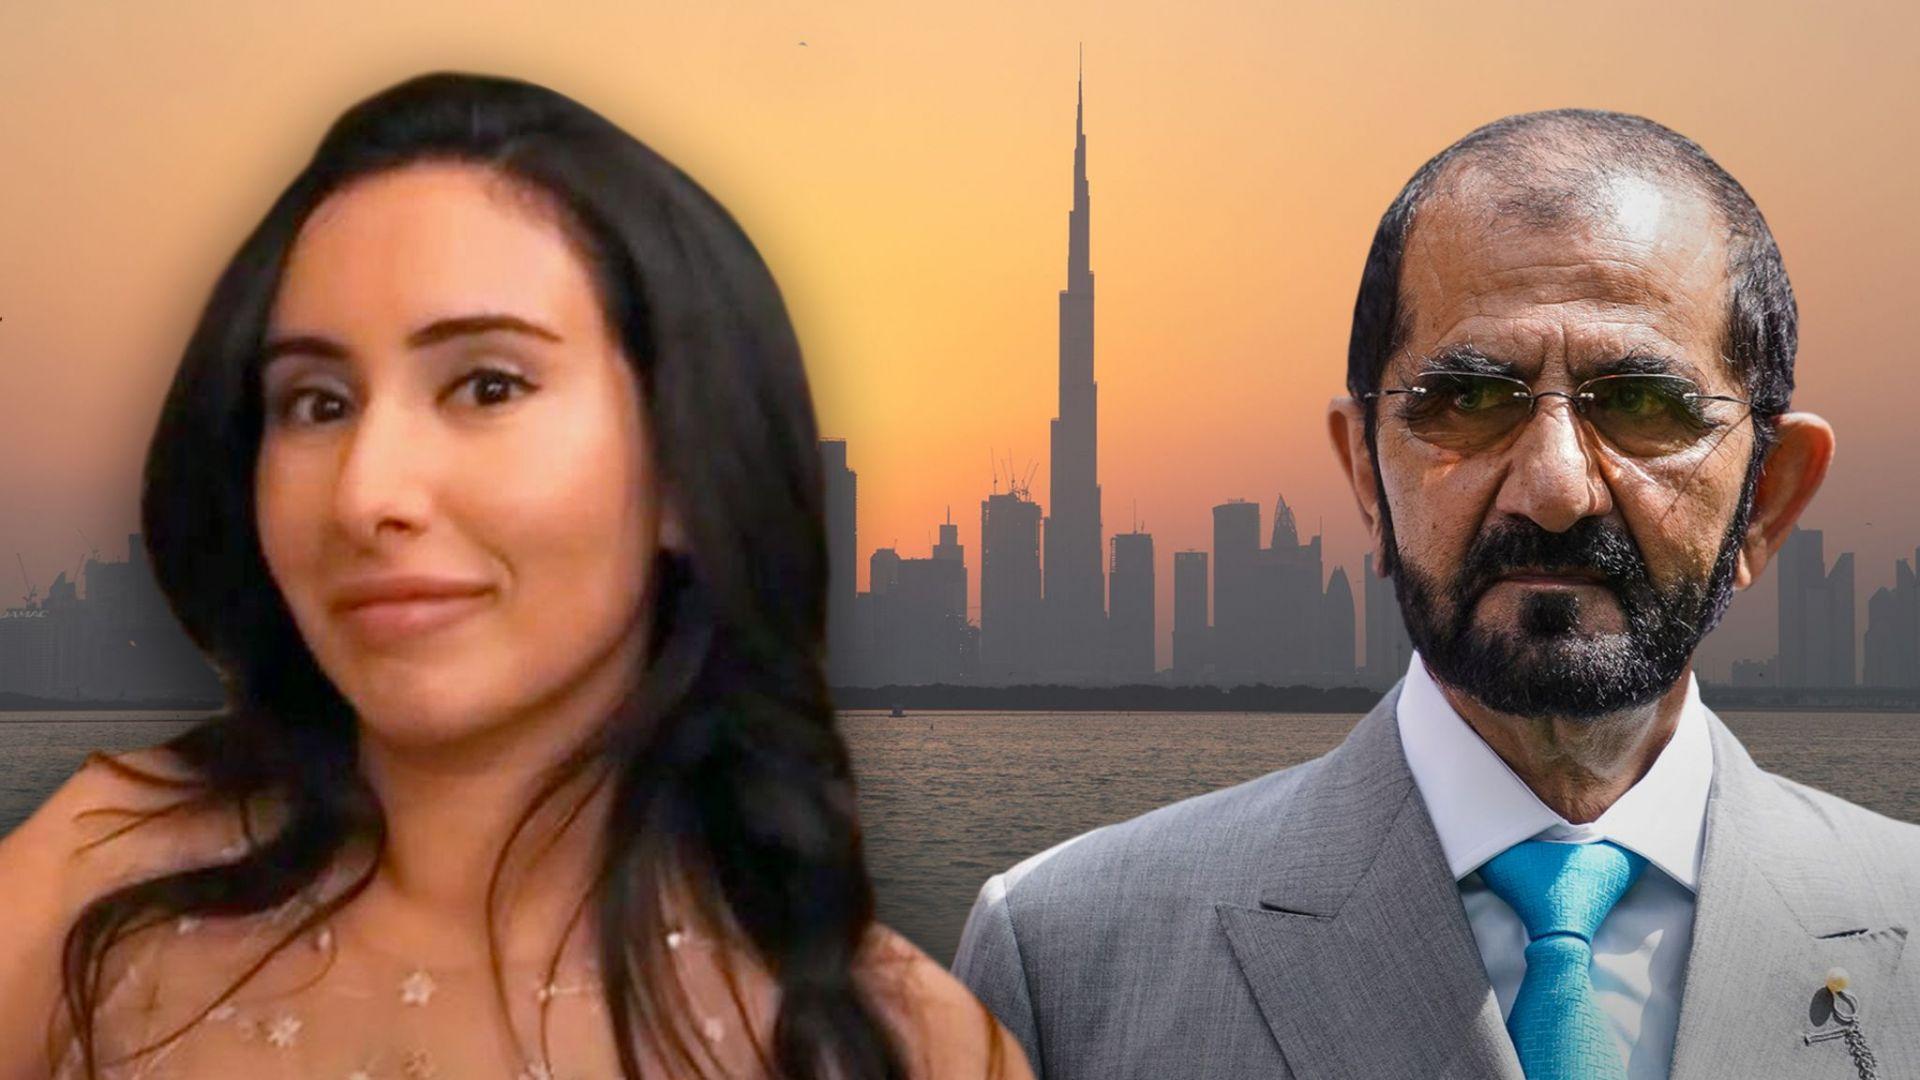 принцеса Латифа и баща ѝ Мохамед бин ал-Мактум - емир на Дубай